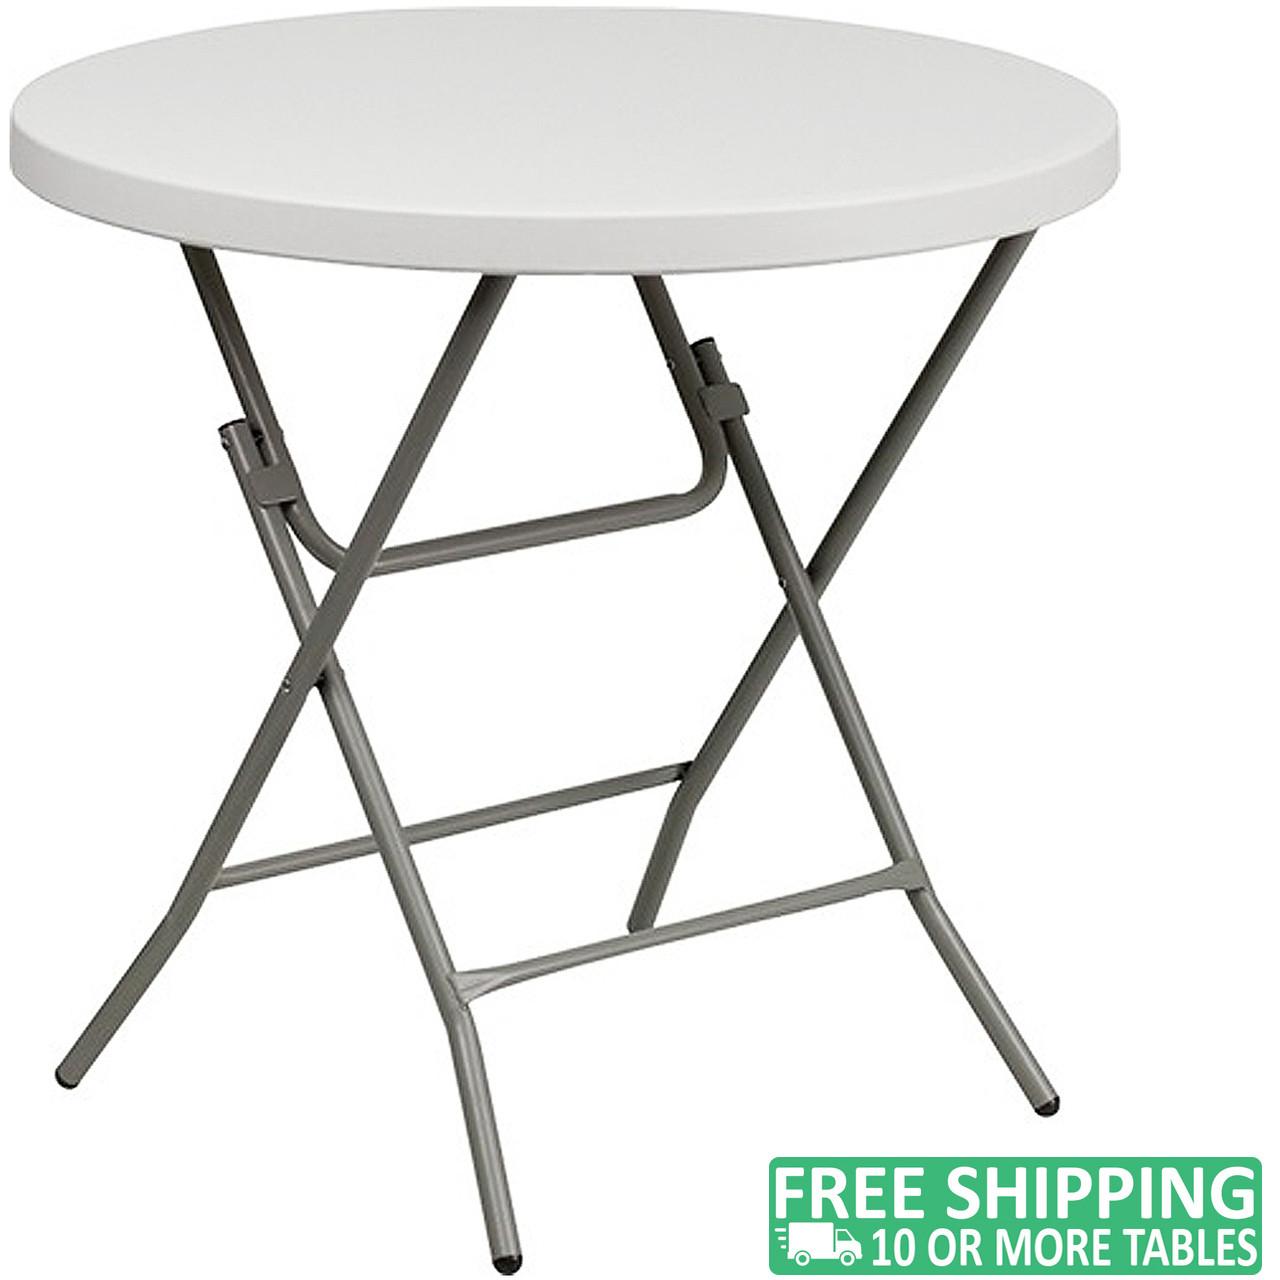 Pleasing Advantage 32 In Round White Plastic Folding Table Adv 32Rlz White Home Remodeling Inspirations Basidirectenergyitoicom